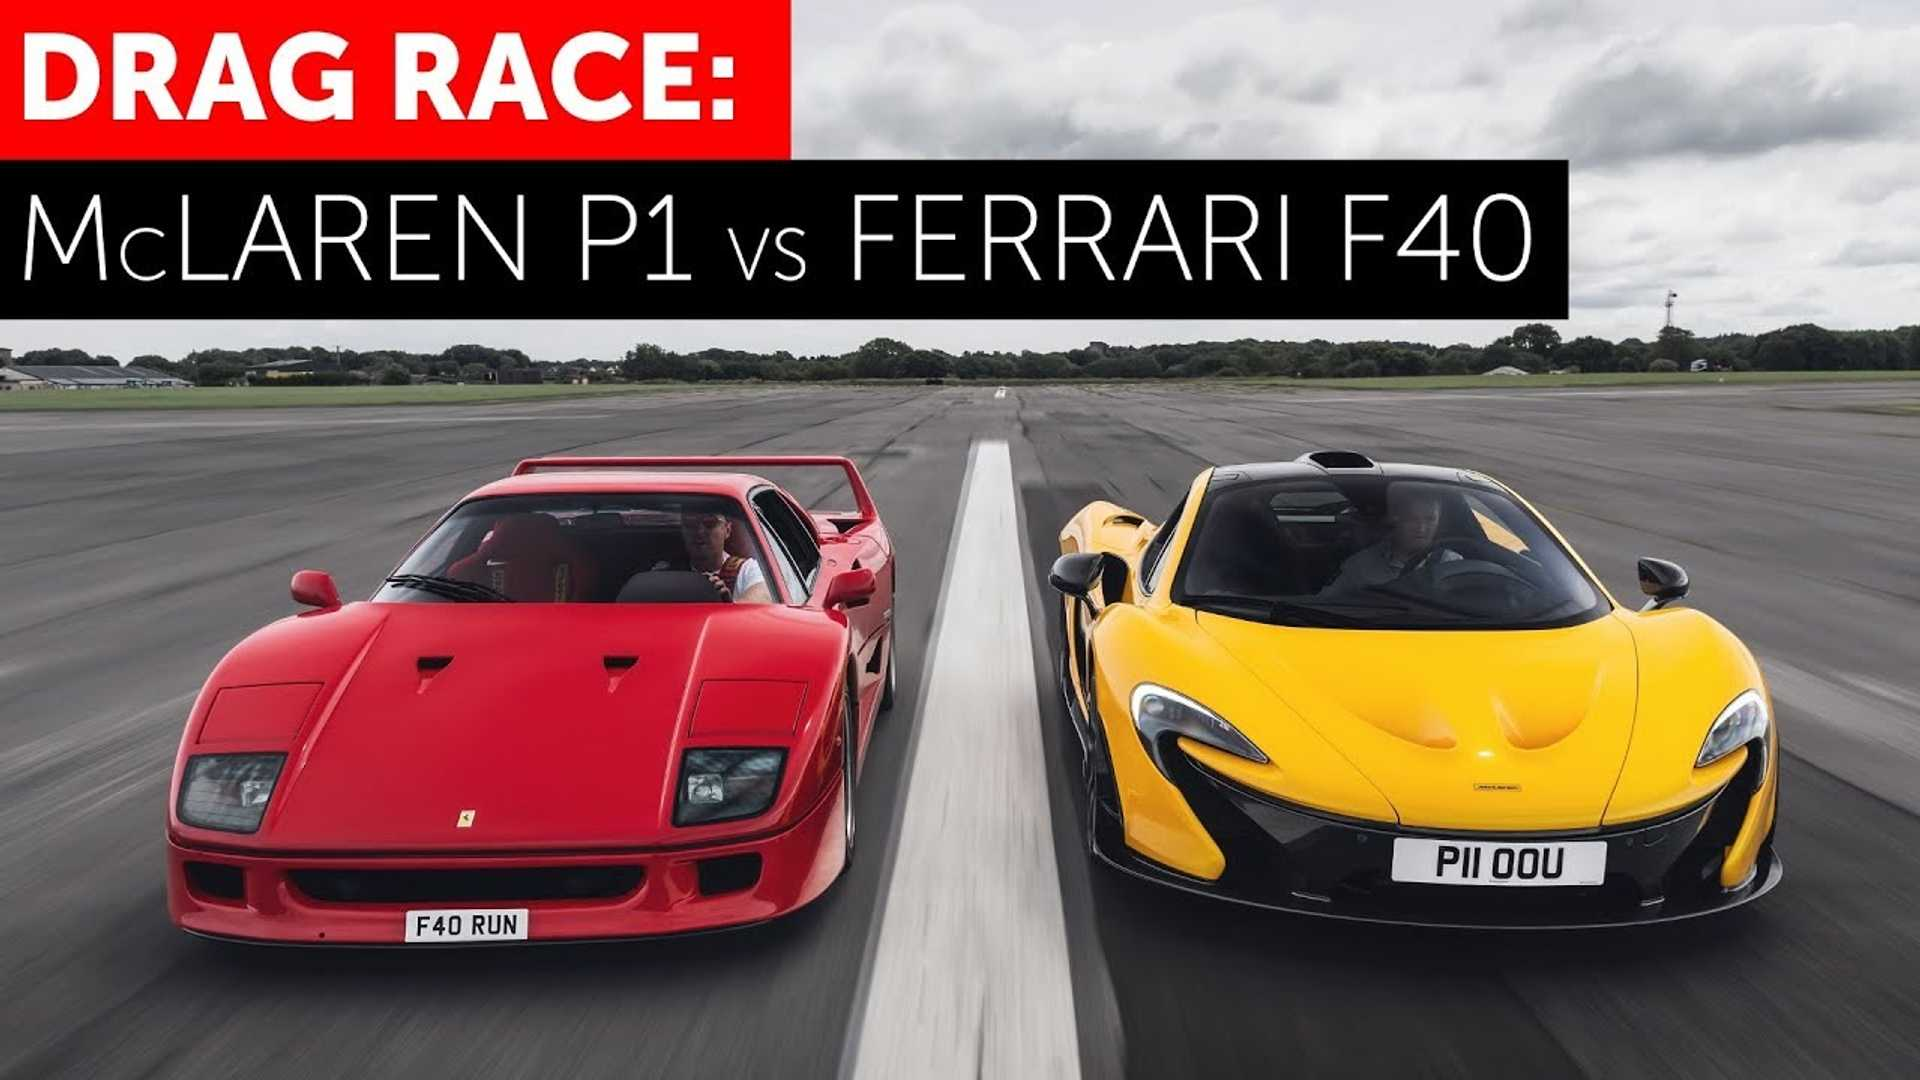 McLaren P1 Vs Ferrari F40 Drag Race Shows Decades Gap Of Engineering